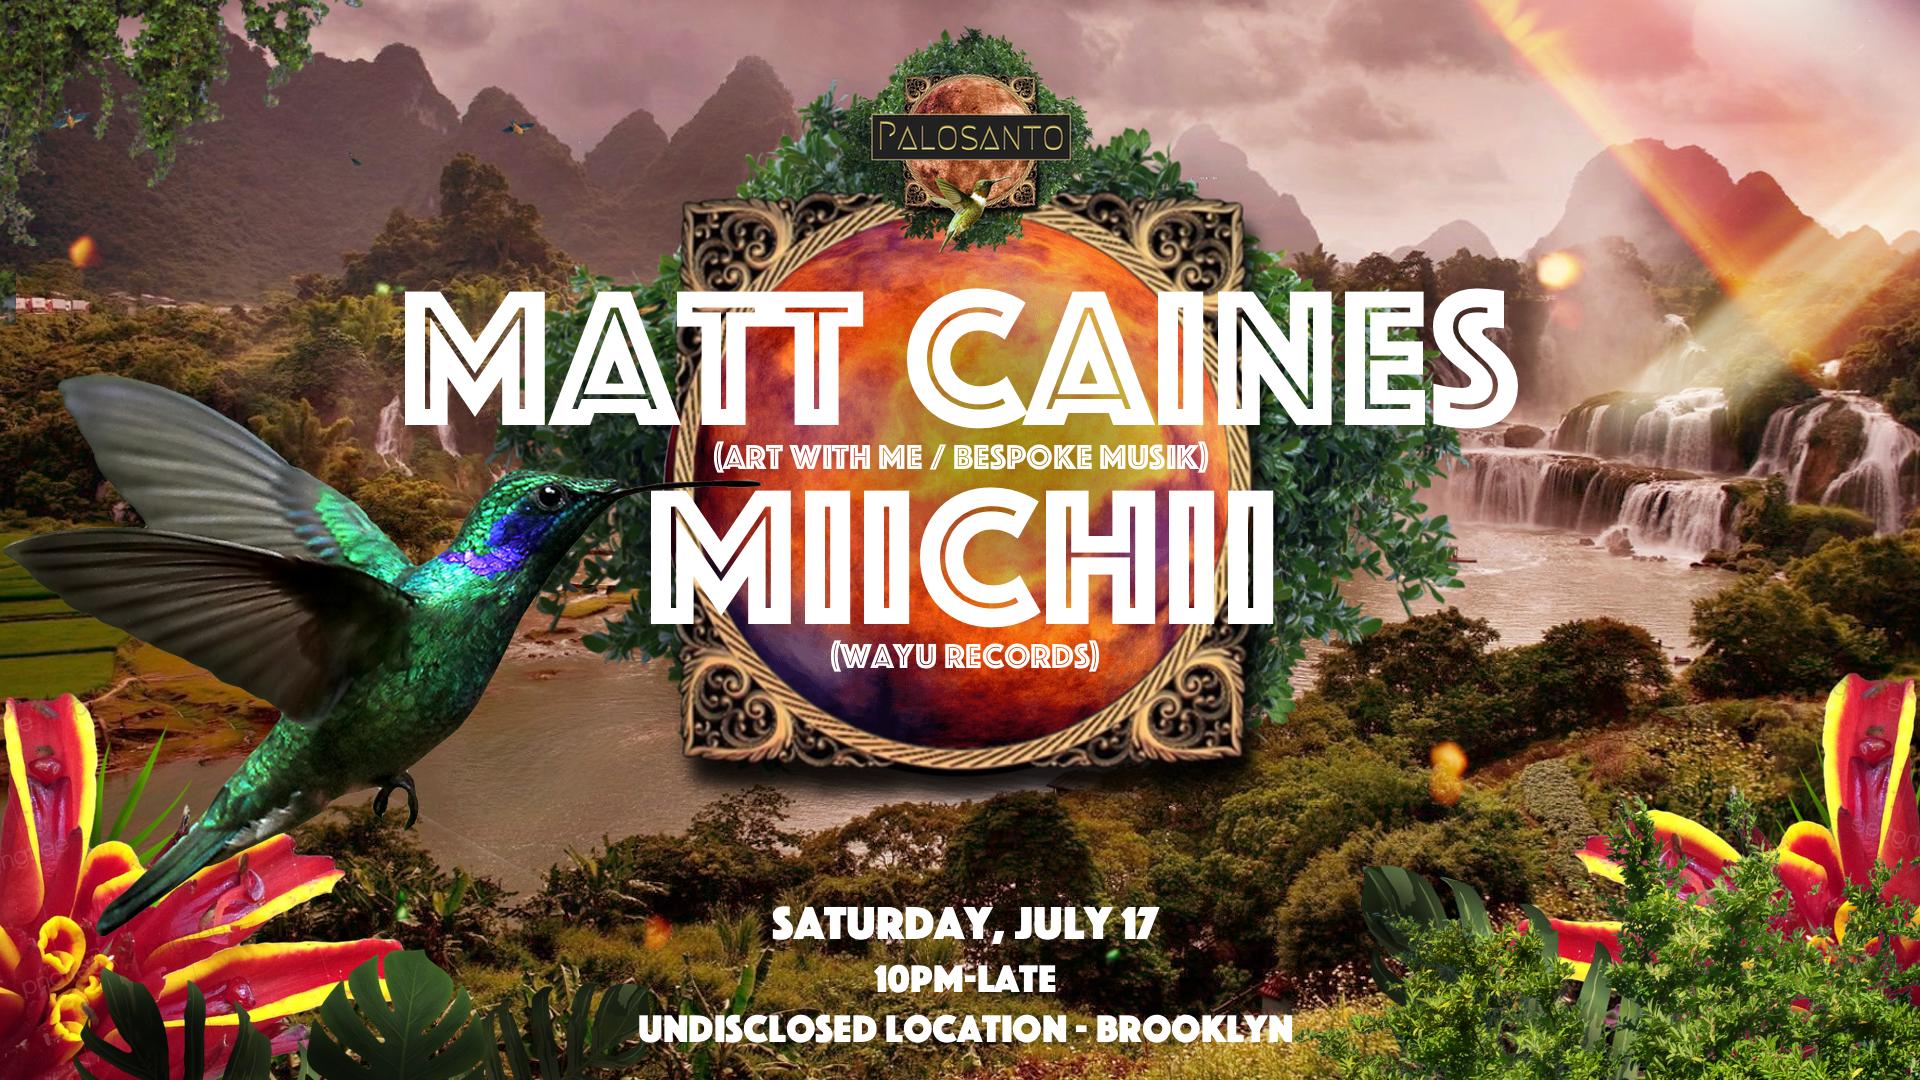 🌿 Palosanto: Matt Caines, Miichii 🌿